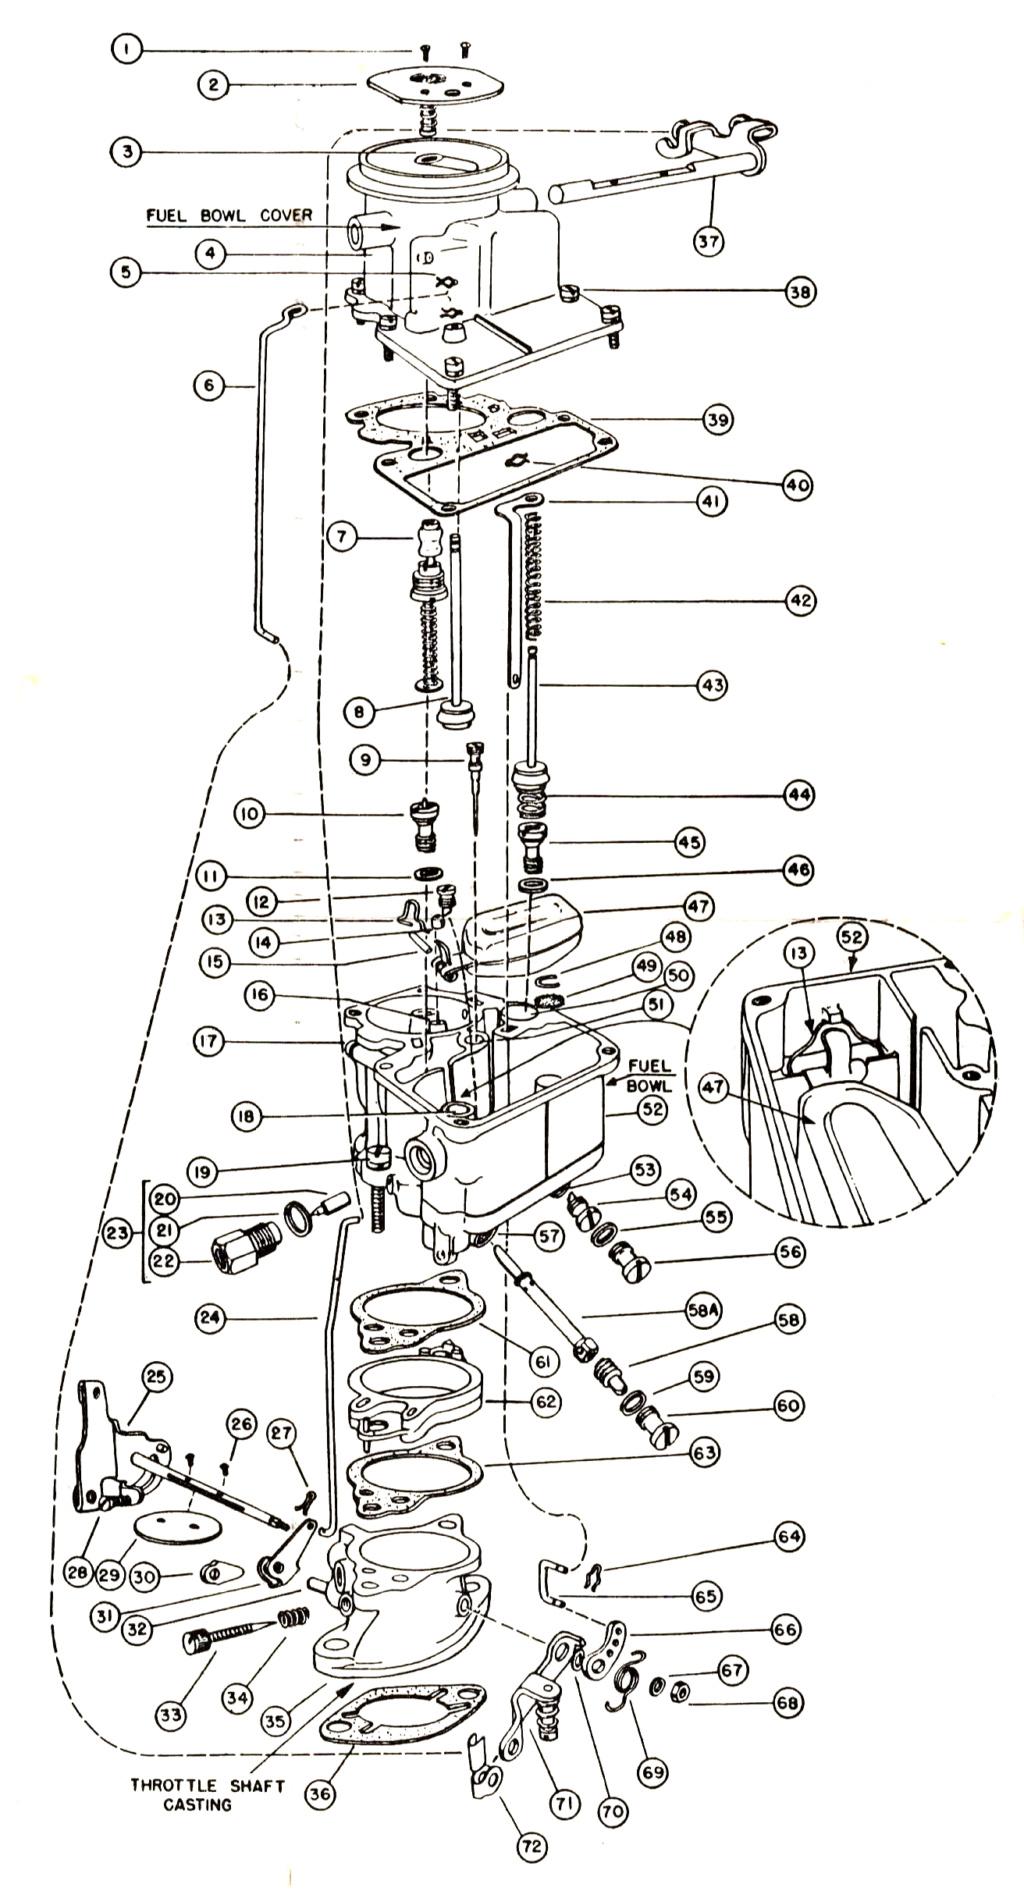 Carburateur 6 cyl flathead - Page 2 Bxvd_e10